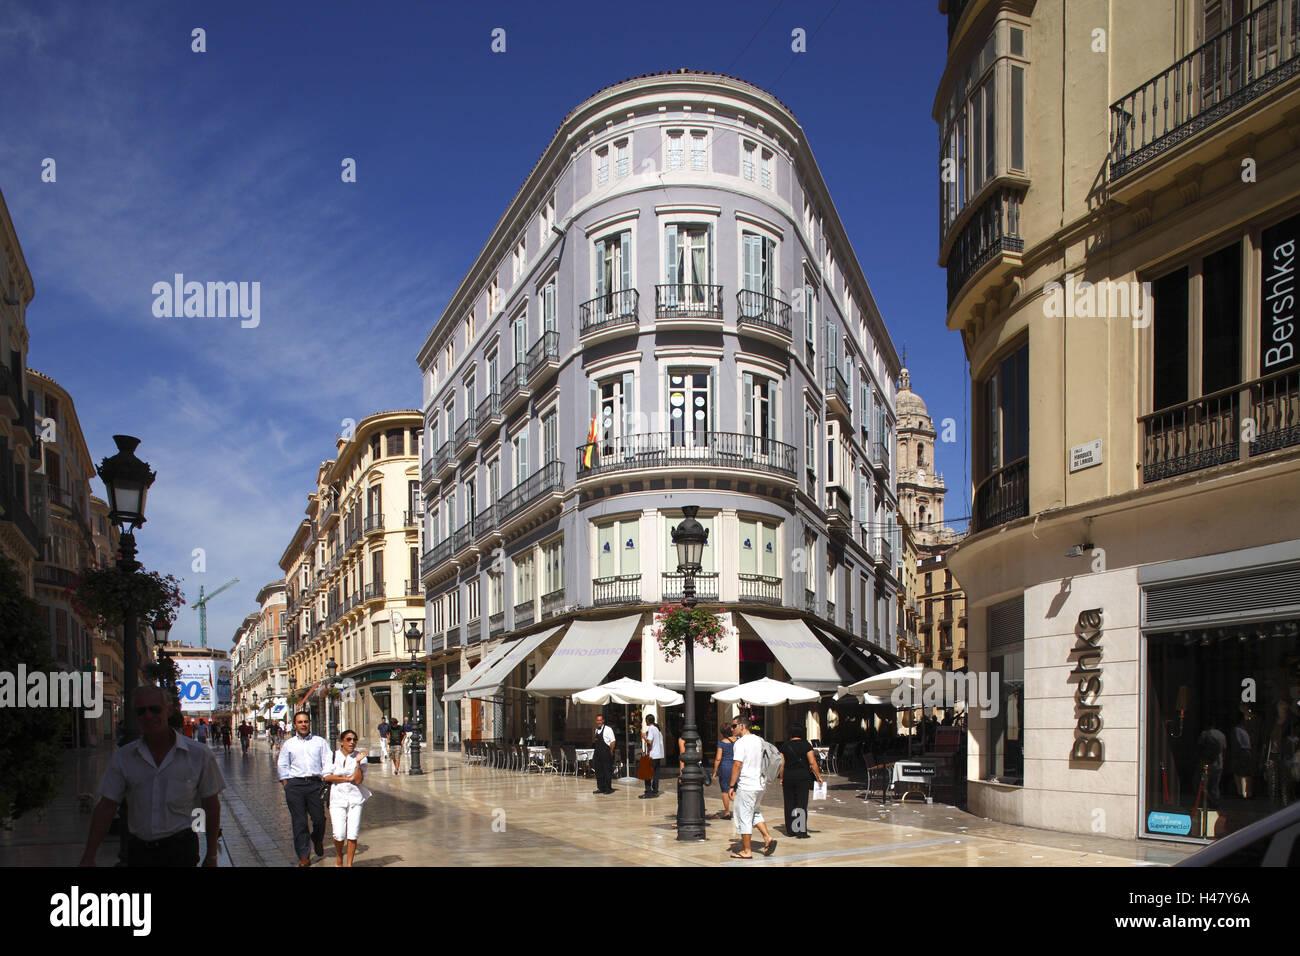 Spain, Andalucia, Malaga, pedestrianized street Marques de Larios, - Stock Image